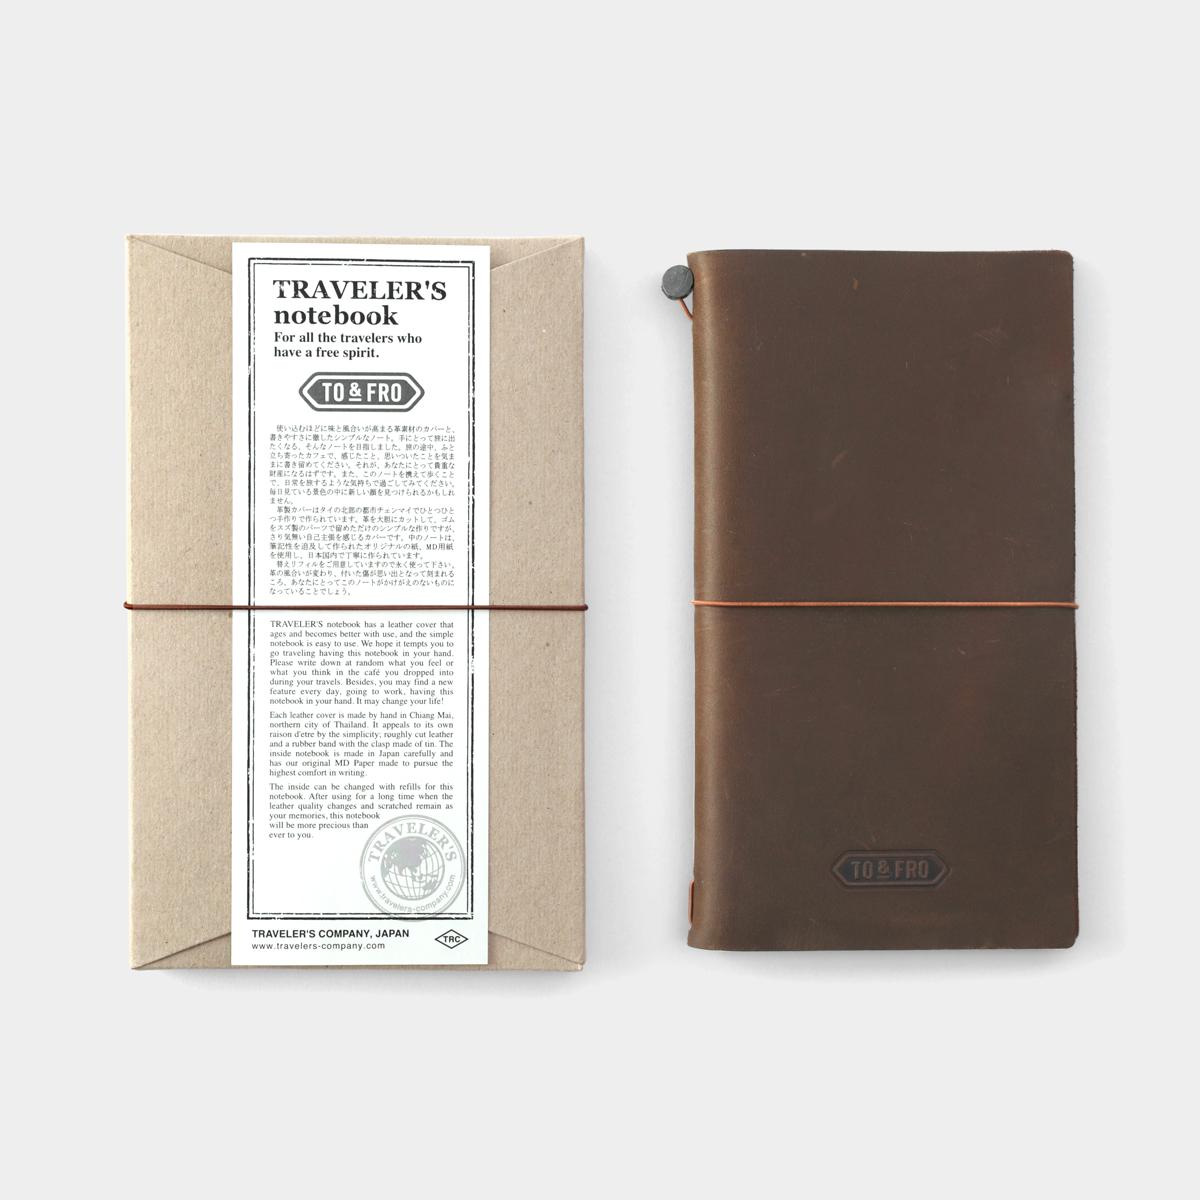 【TO&FRO×TRAVELER'S COMPANY】TO&FROトラベラーズノート  レギュラーサイズ